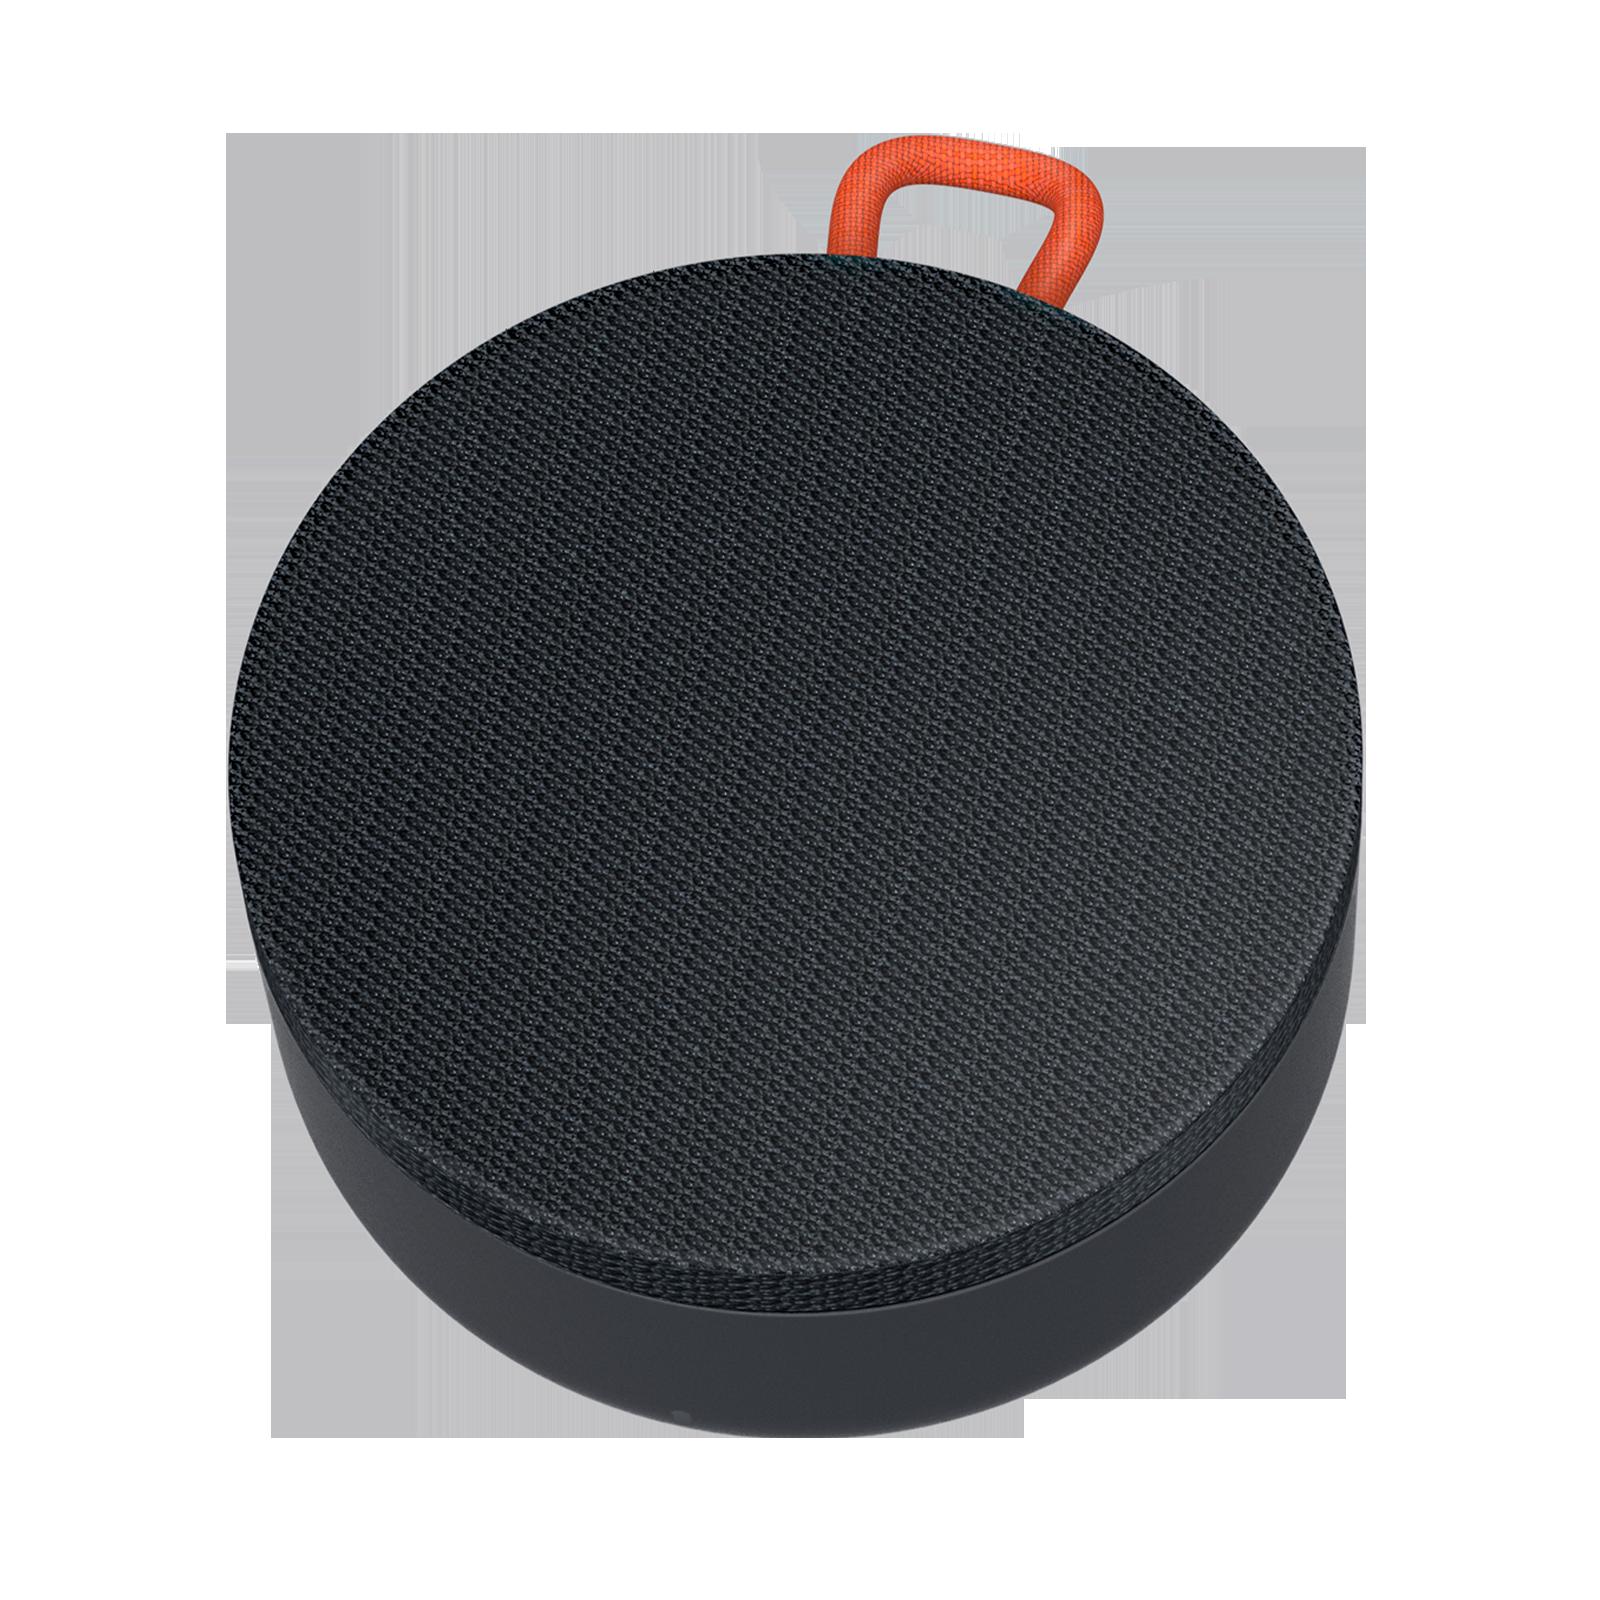 Mi Portable Bluetooth Speaker Mini Gris